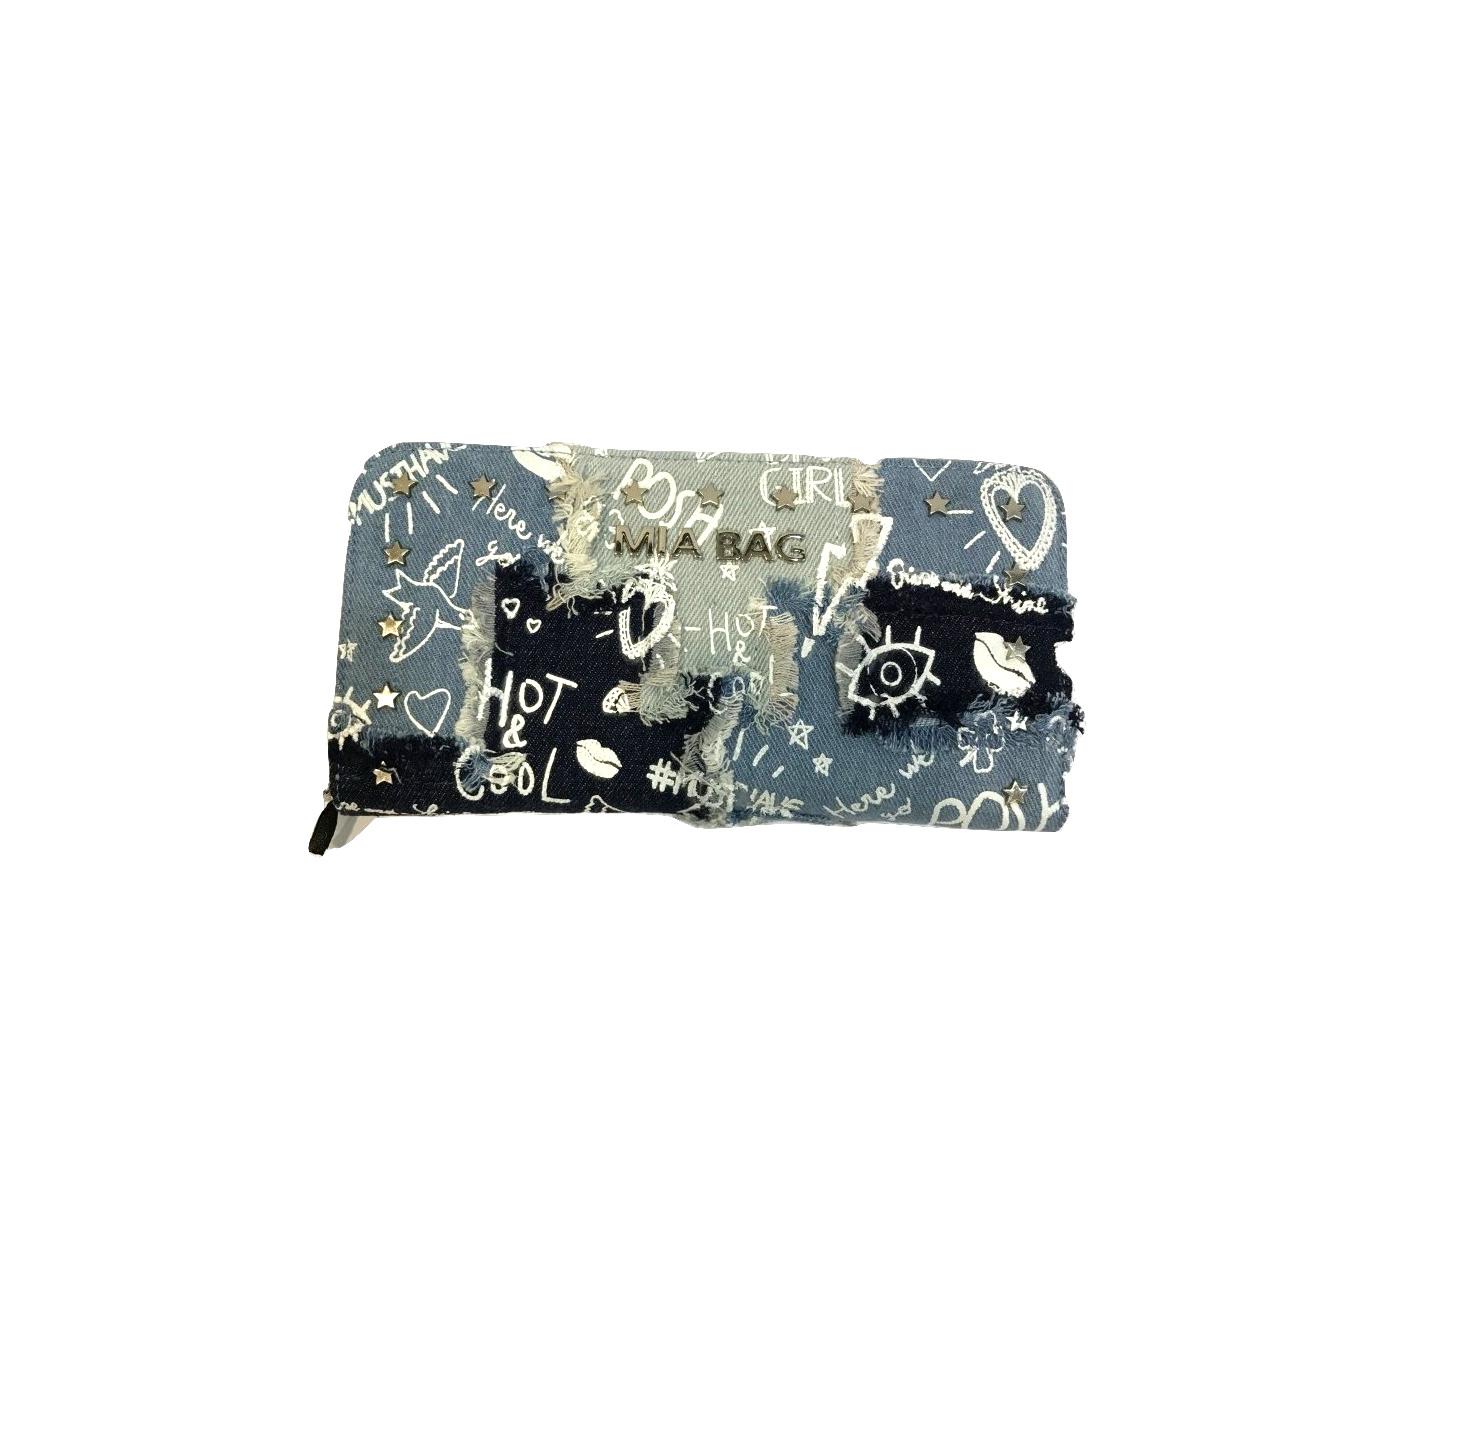 Borsa Donna Mia Bag Portafoglio Denim Patch Stampa Graffiti Bianco 2017 Bianco-  - ebay.it